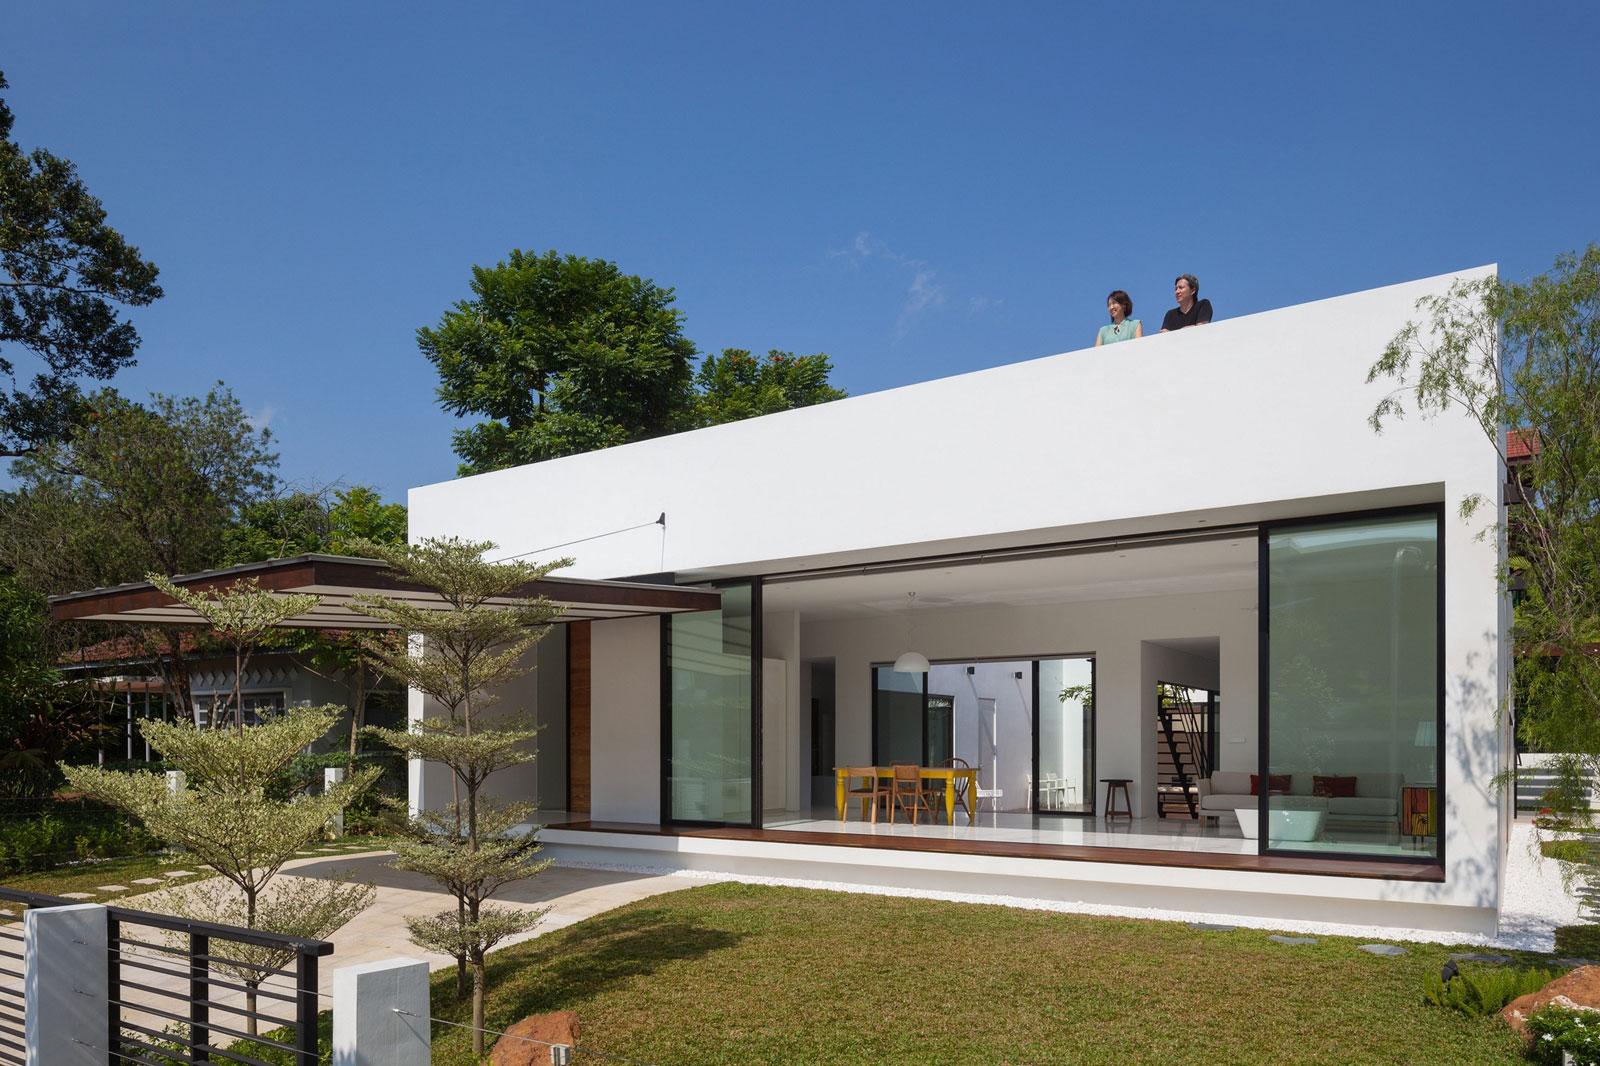 Modelos de casas modernas for Fotos de casas modernas de una planta